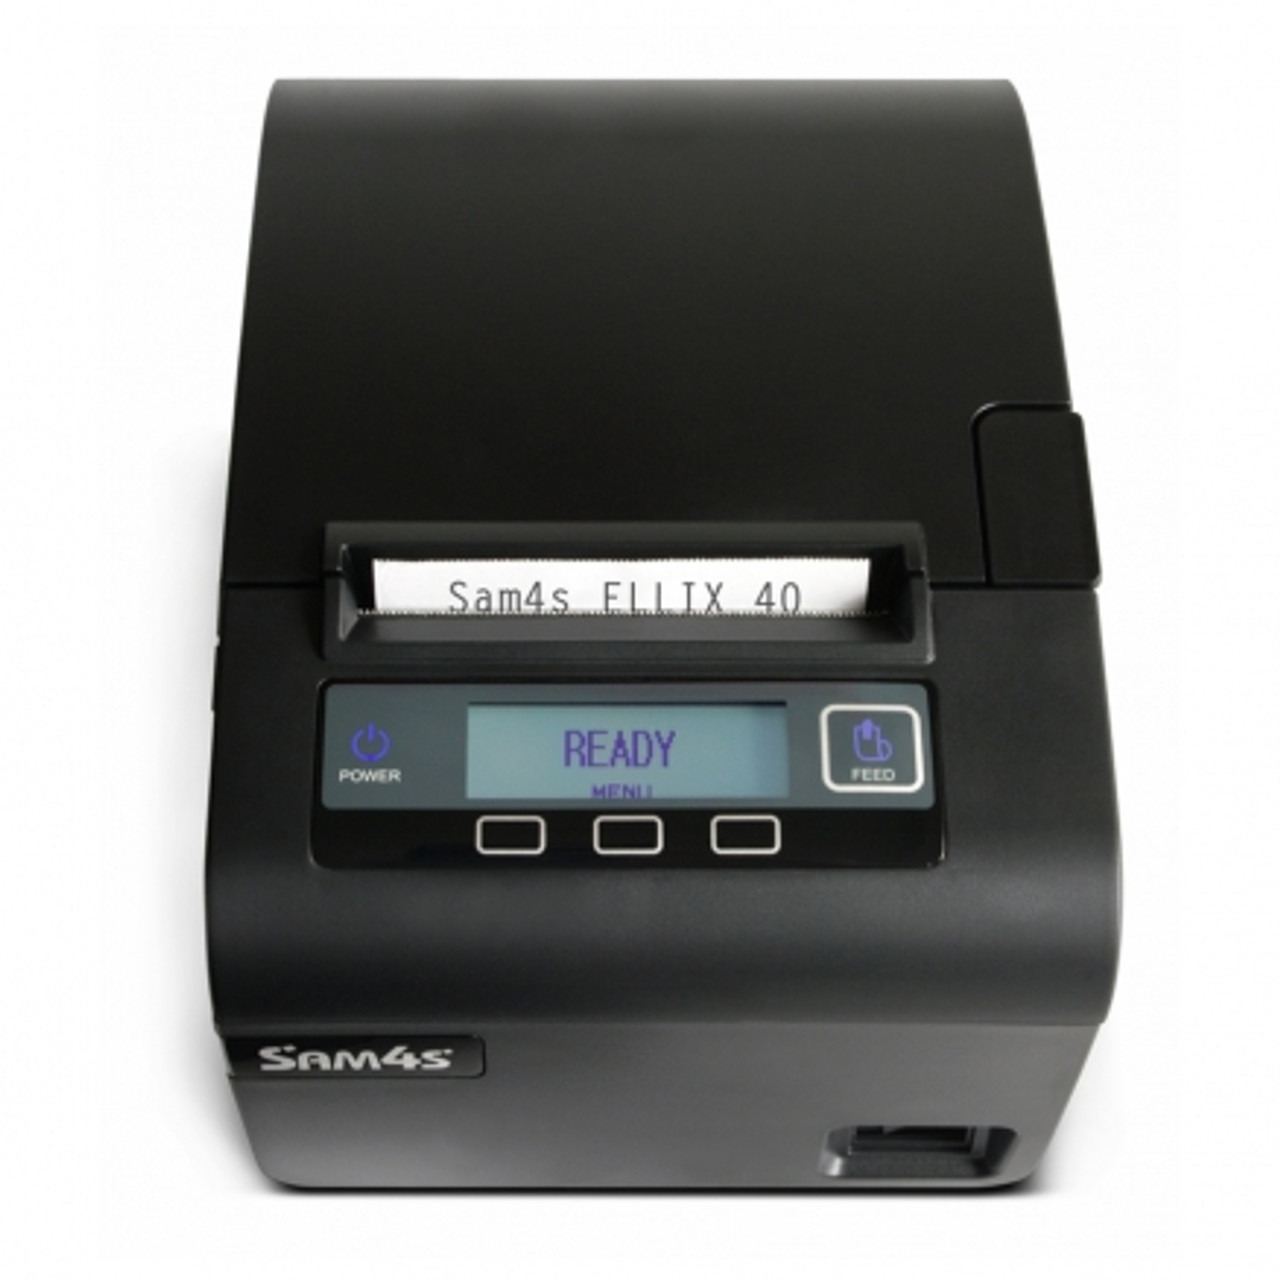 SAM4s Ellix 40 POS Thermal Receipt Printer